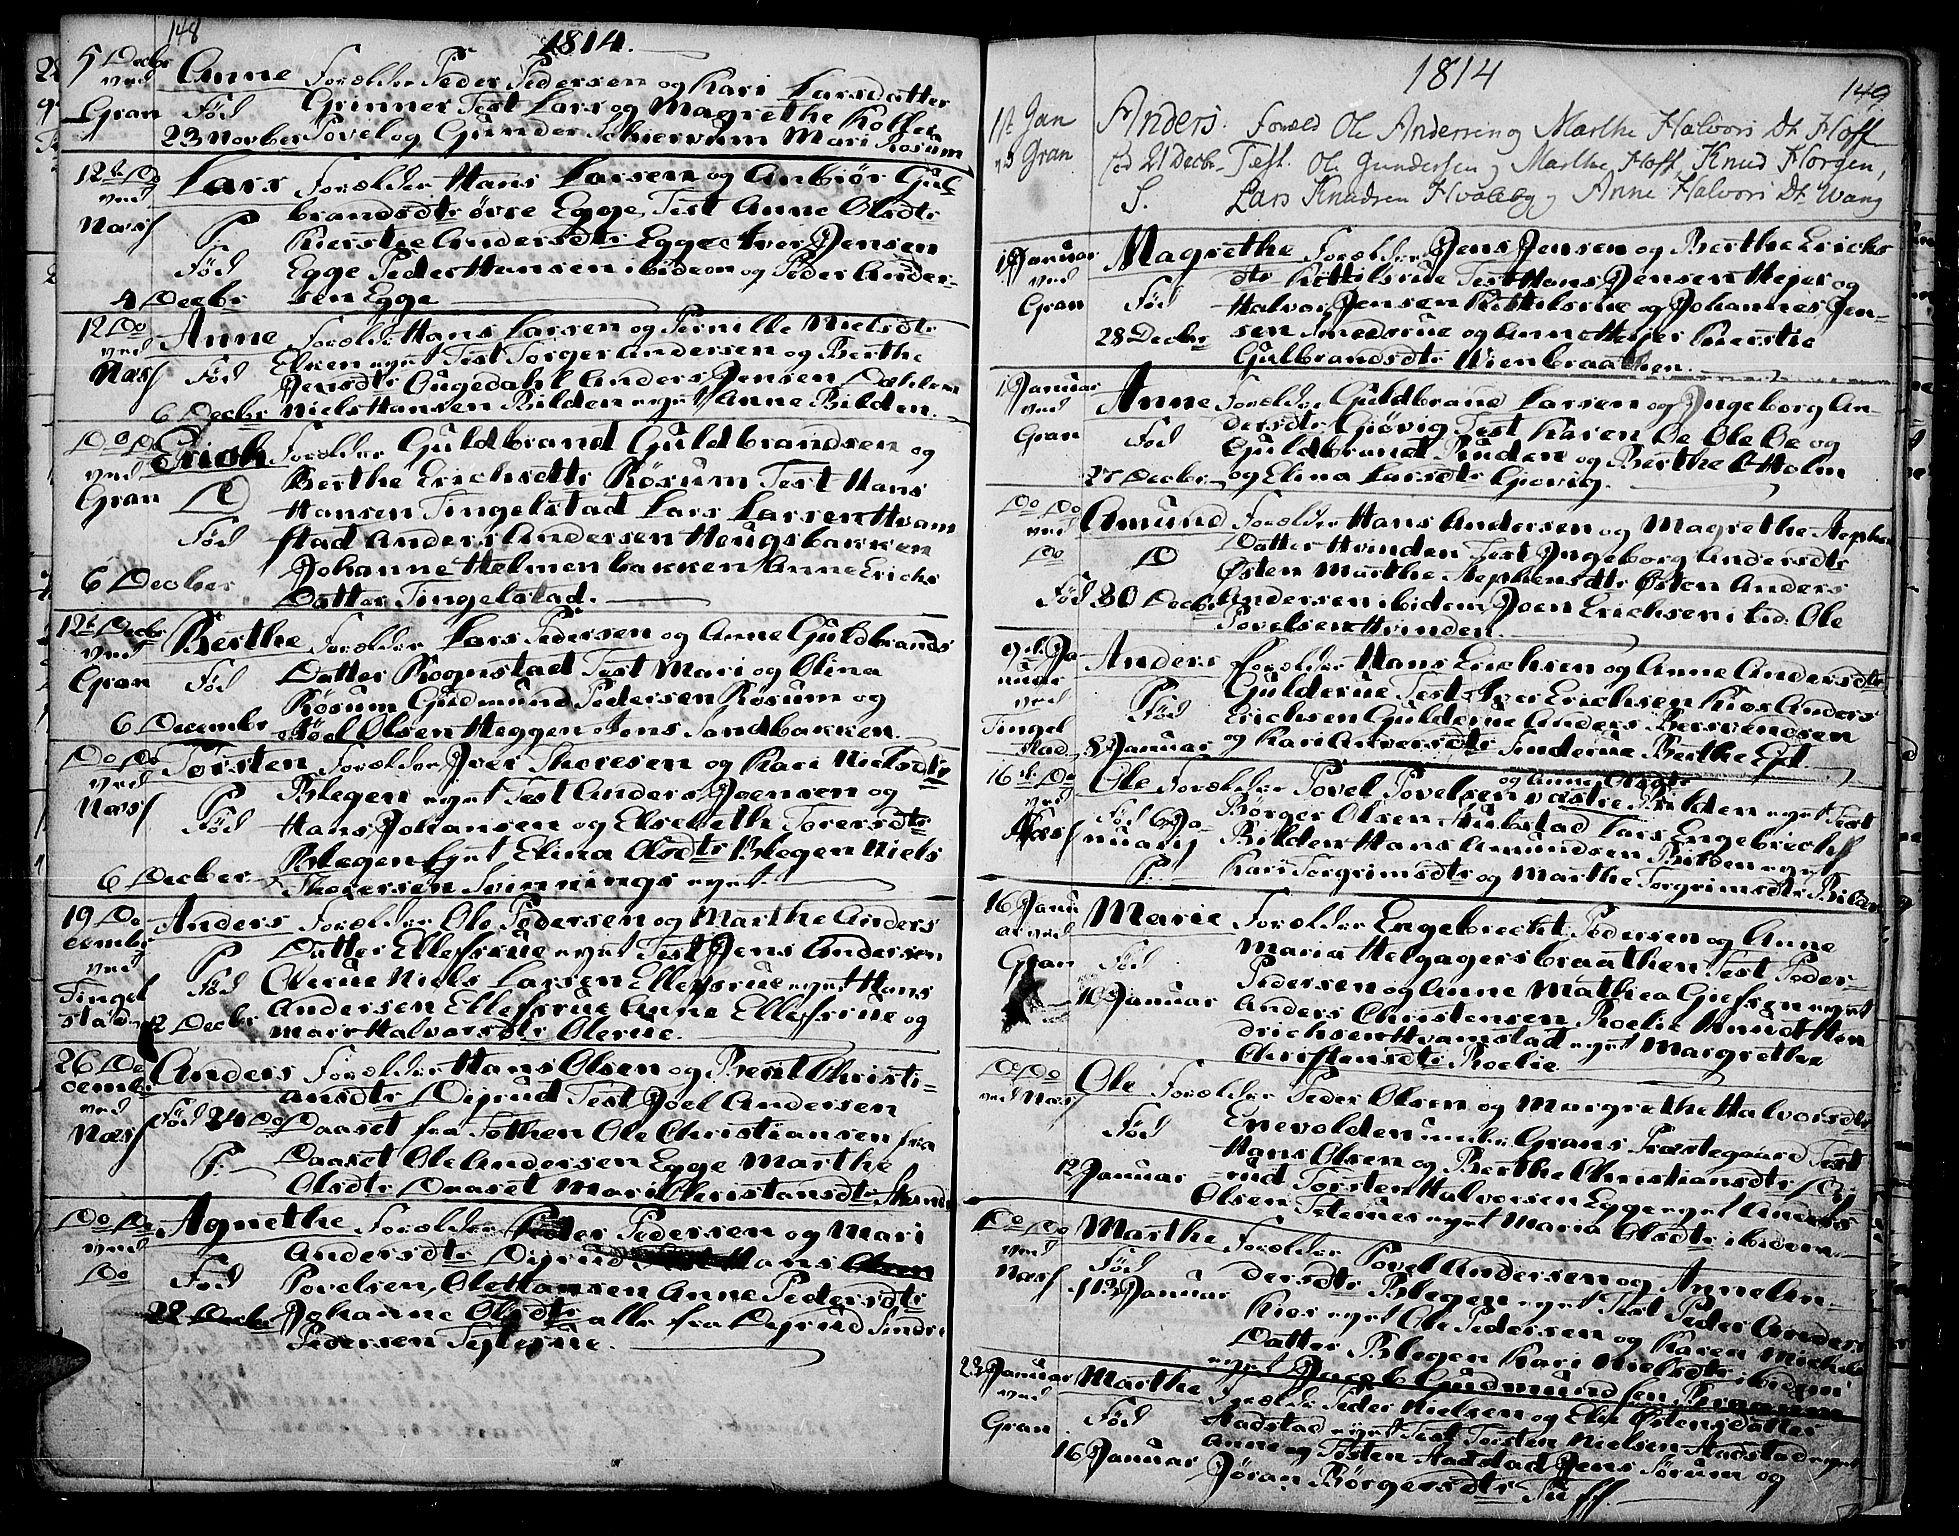 SAH, Gran prestekontor, Ministerialbok nr. 7, 1804-1815, s. 148-149